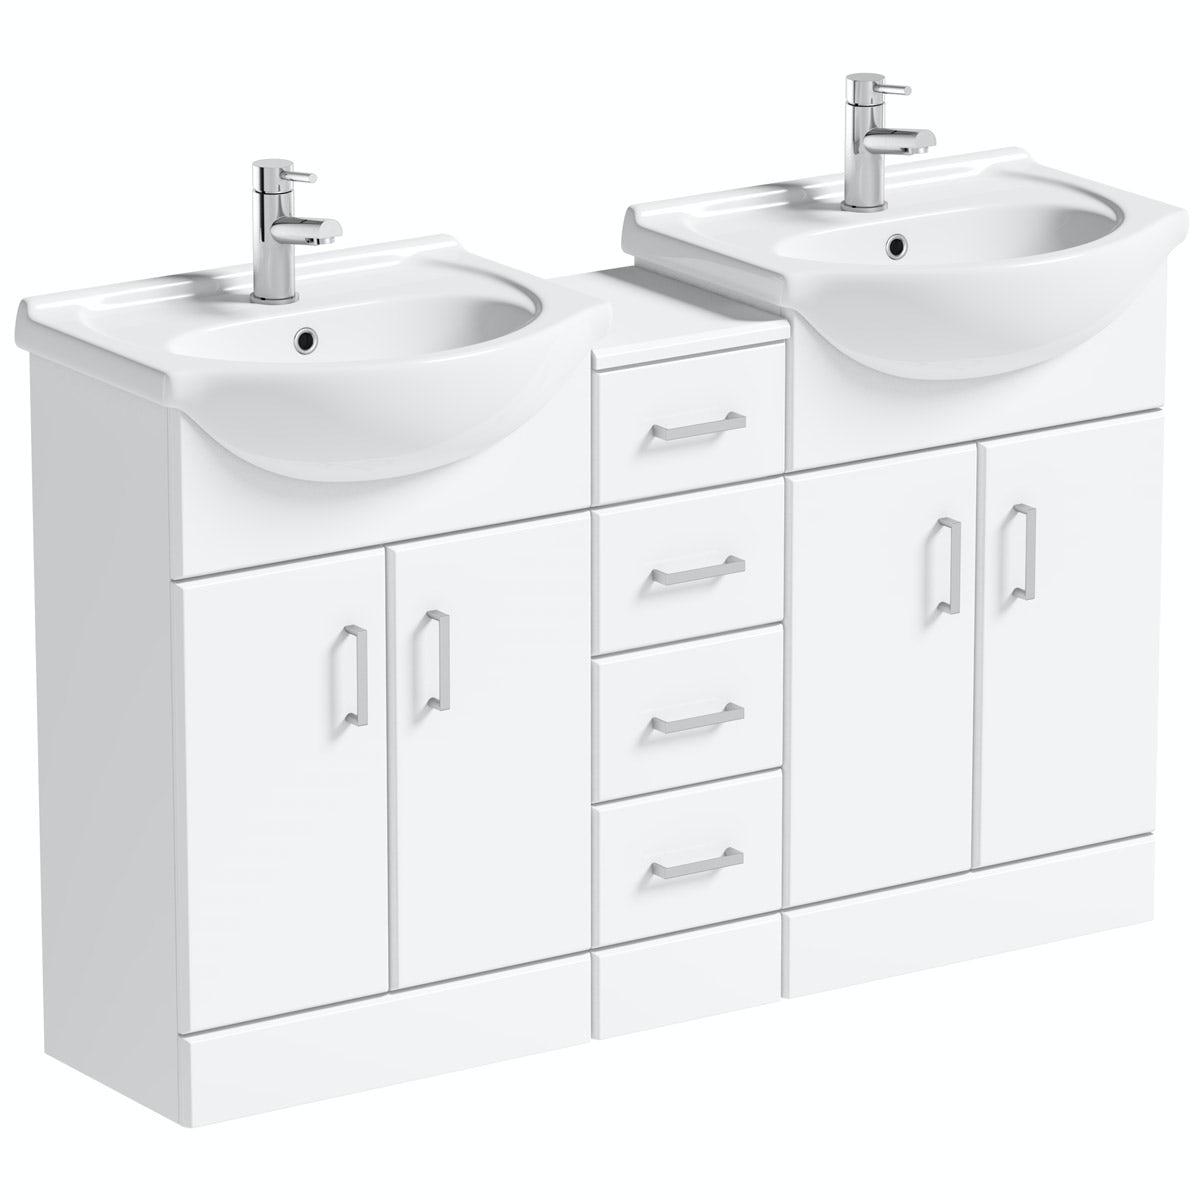 Orchard Eden white double basin & multi drawer combination